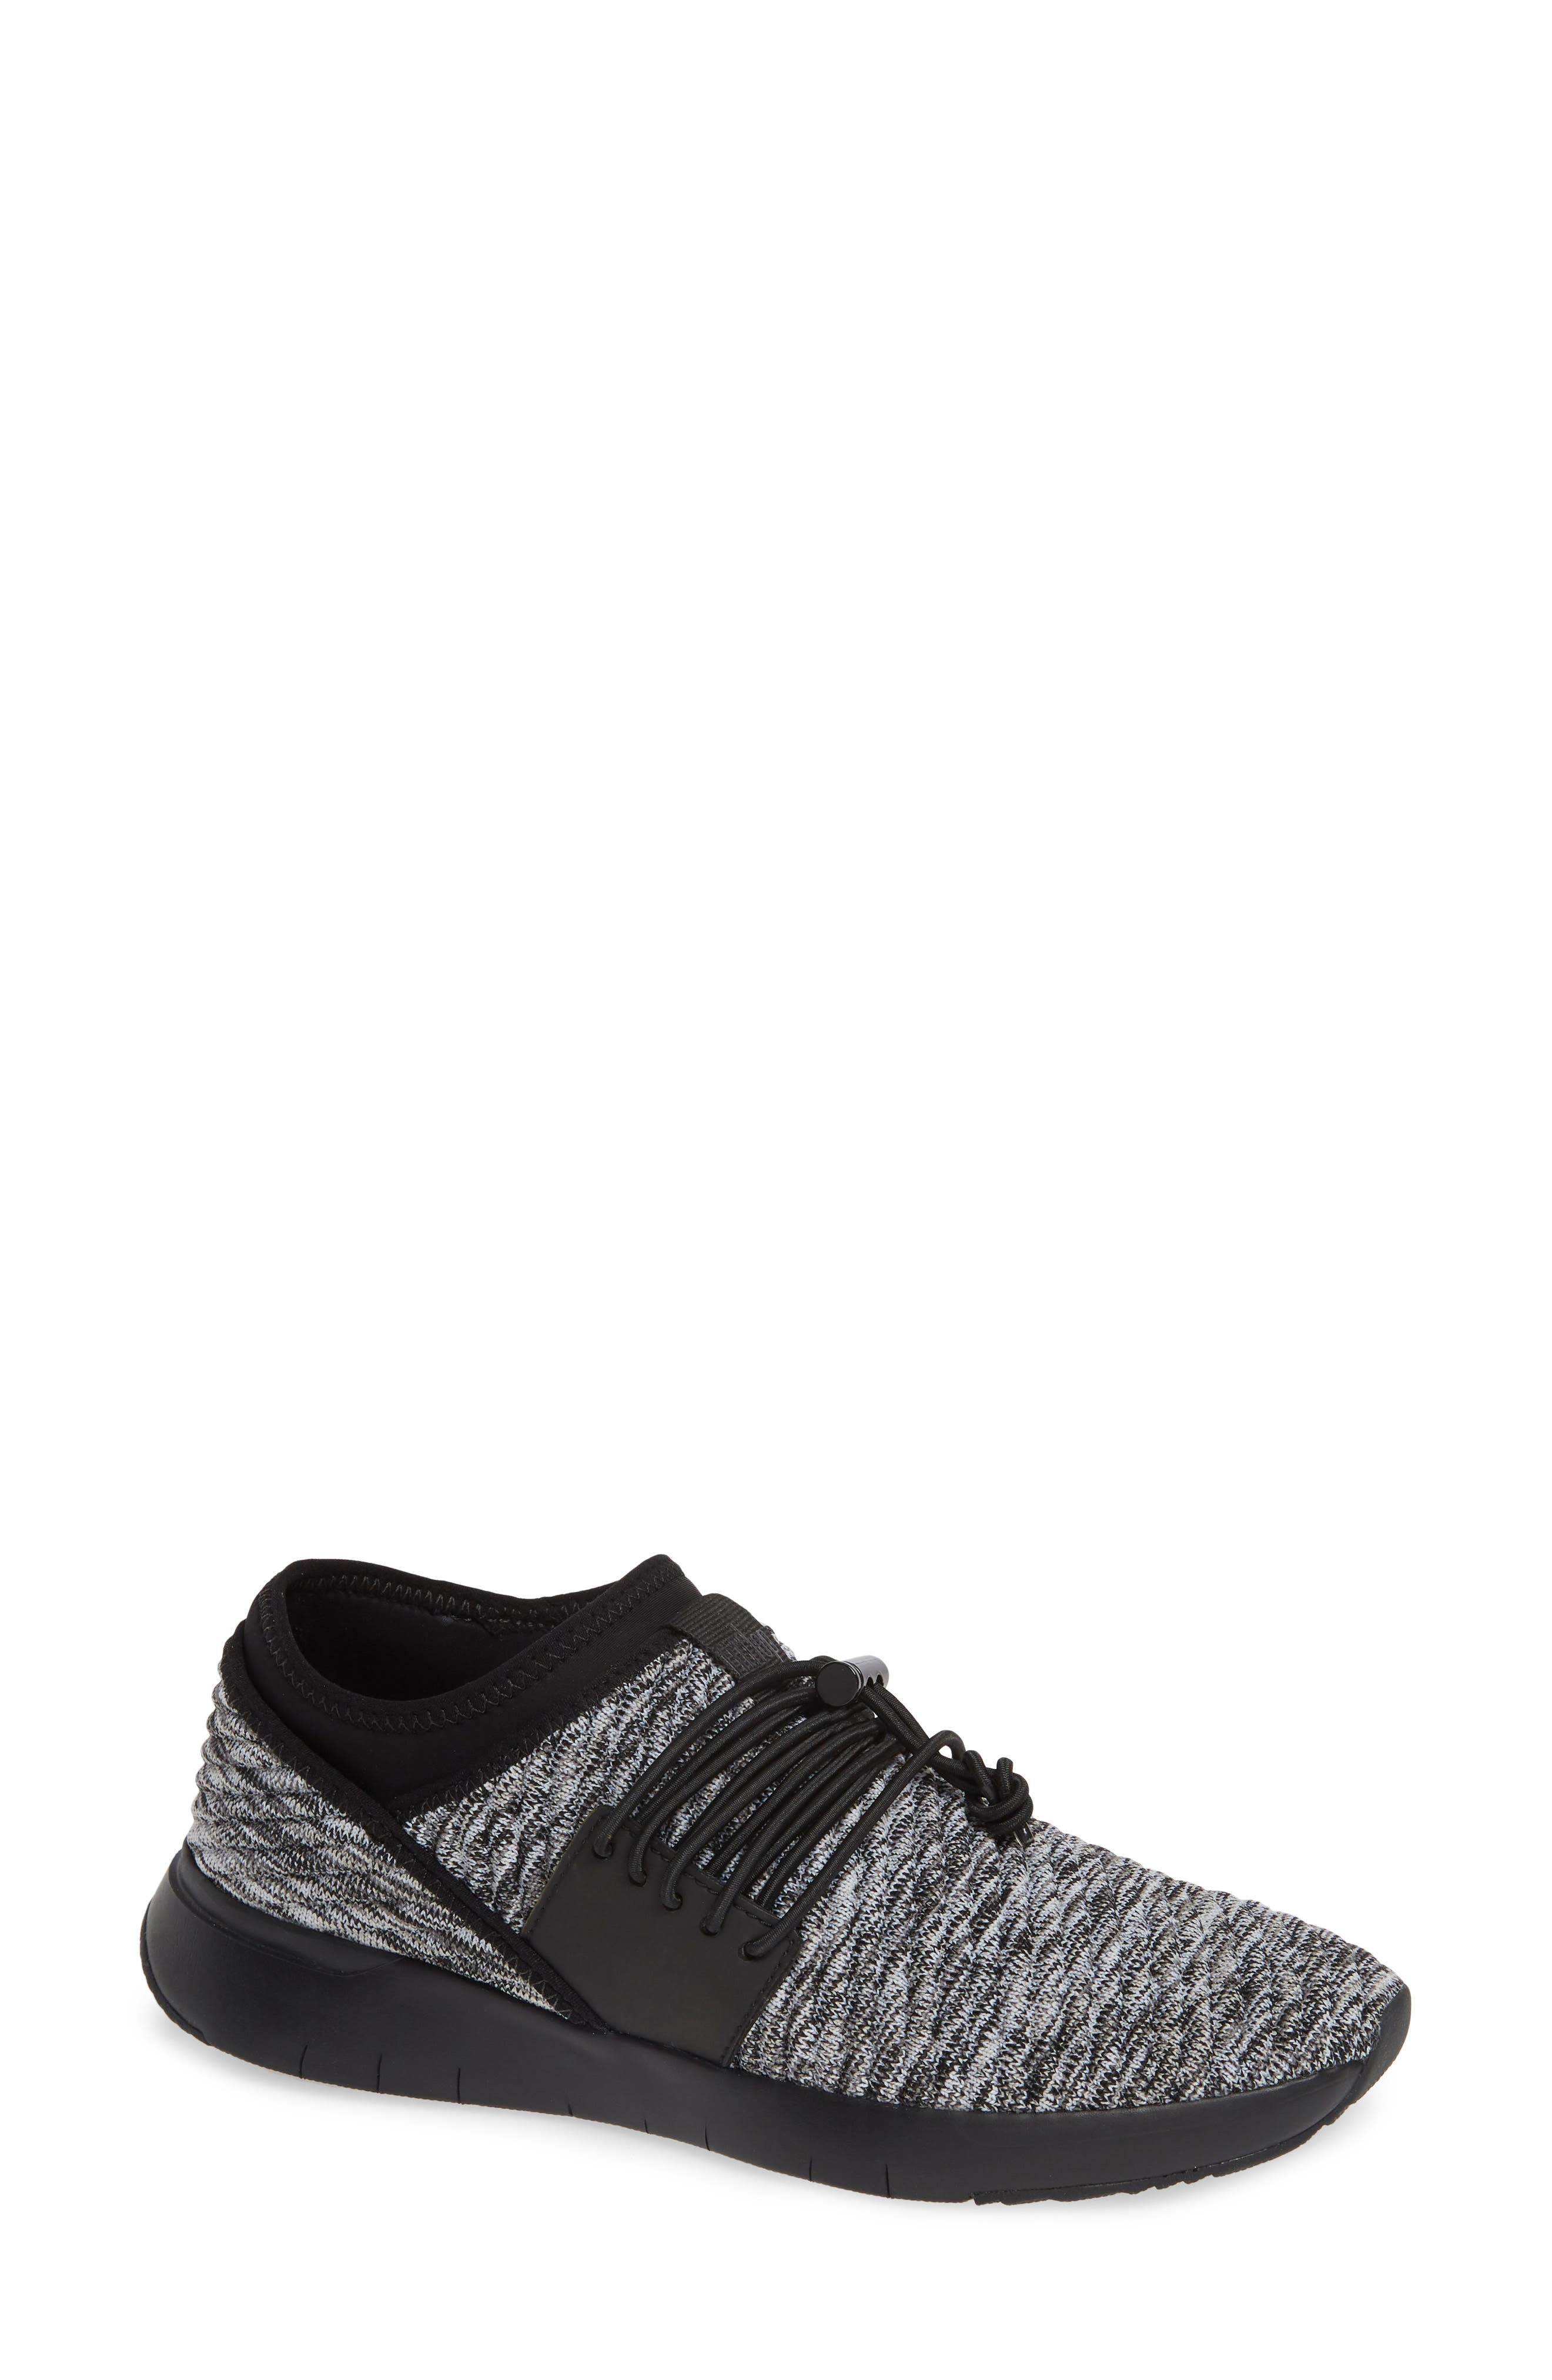 FITFLOP Artknit Sock Sneaker, Main, color, 017